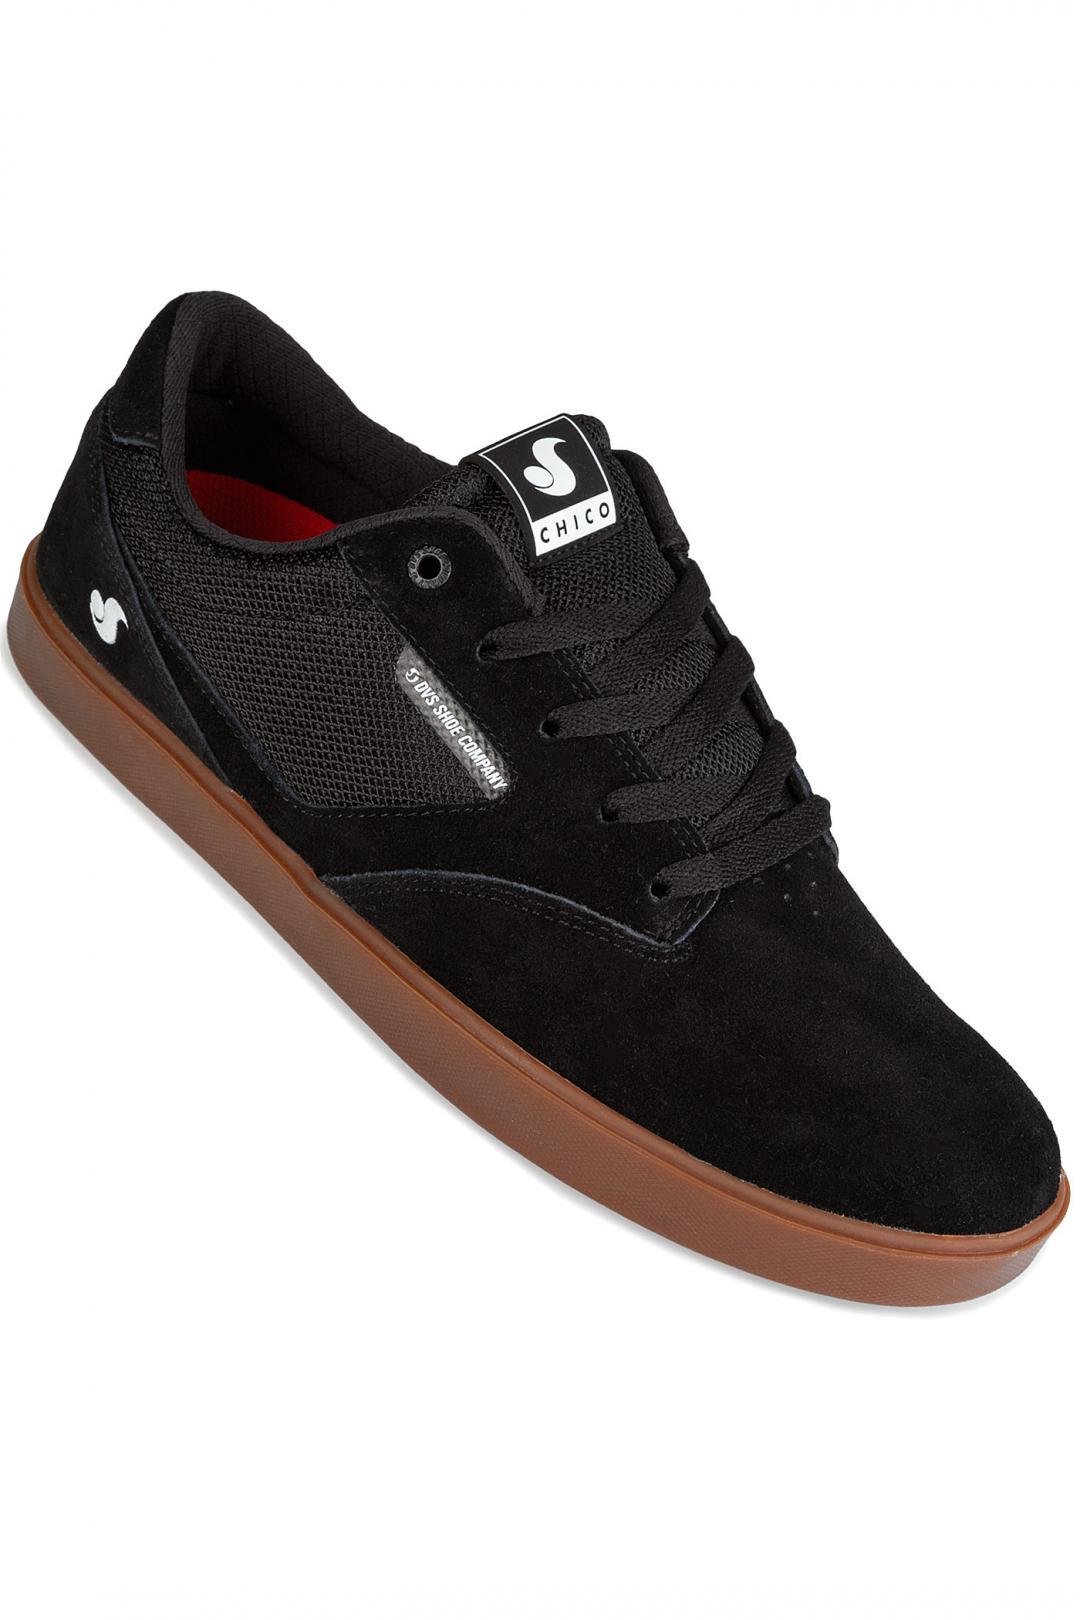 Uomo DVS Pressure SC Suede black gum chico | Sneakers low top